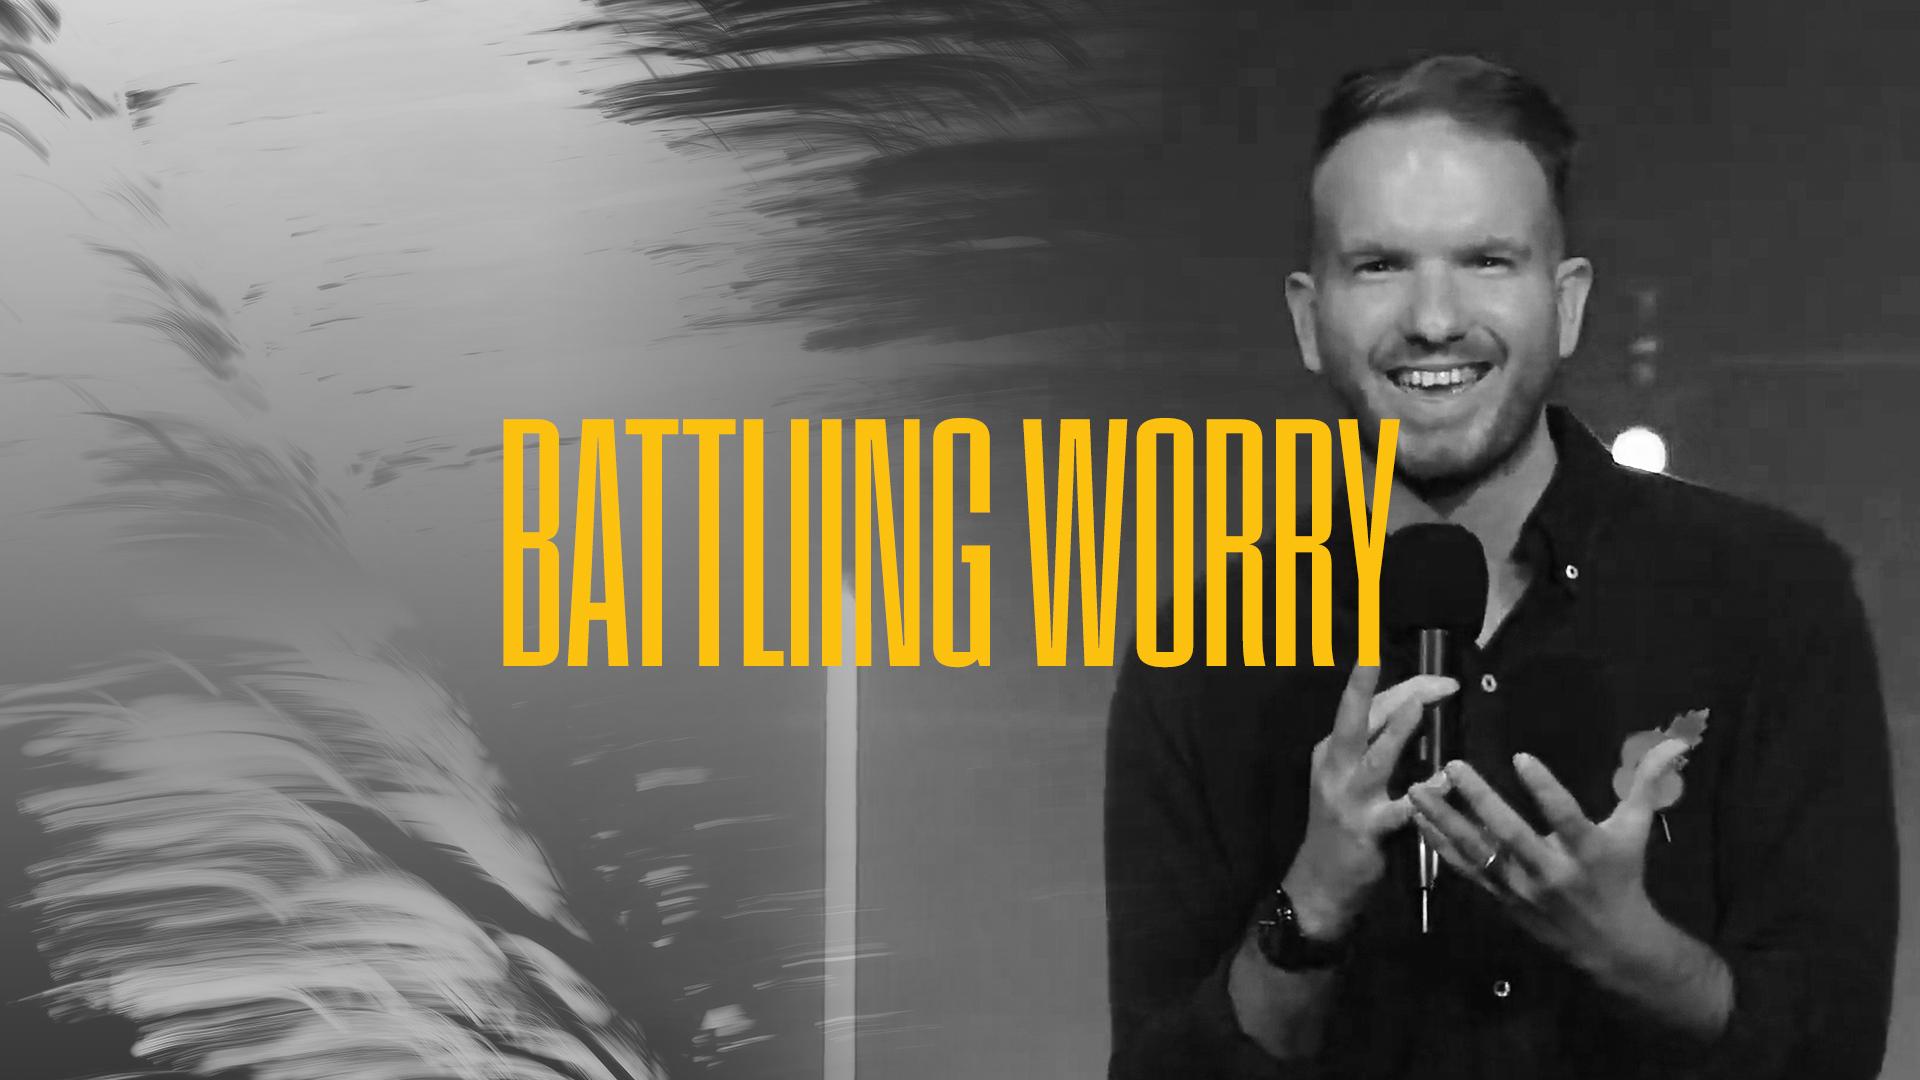 Battling Worry - Sunday 8th November - Jamie haRLAND